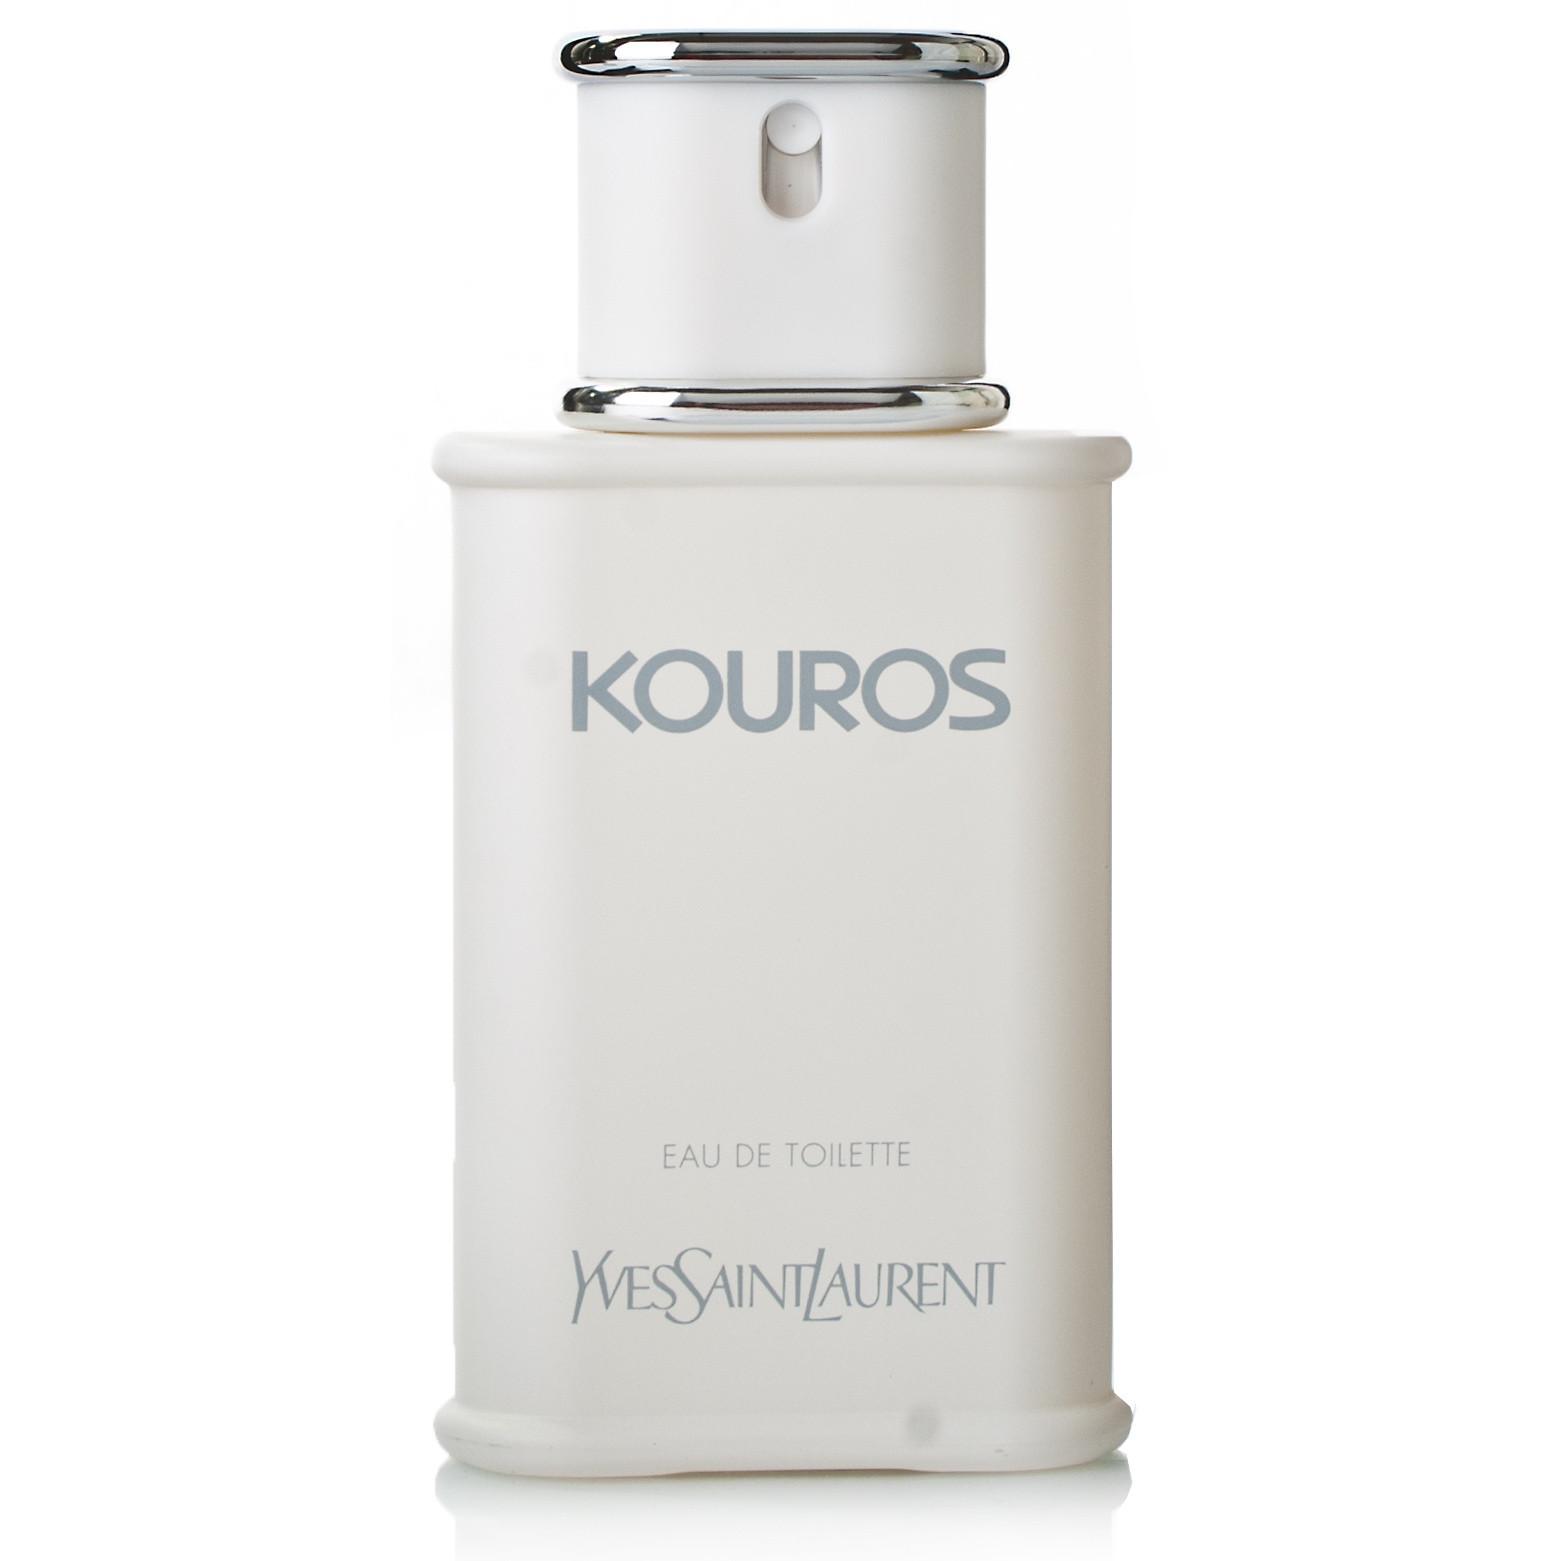 Kouros, Yves Saint Laurent.